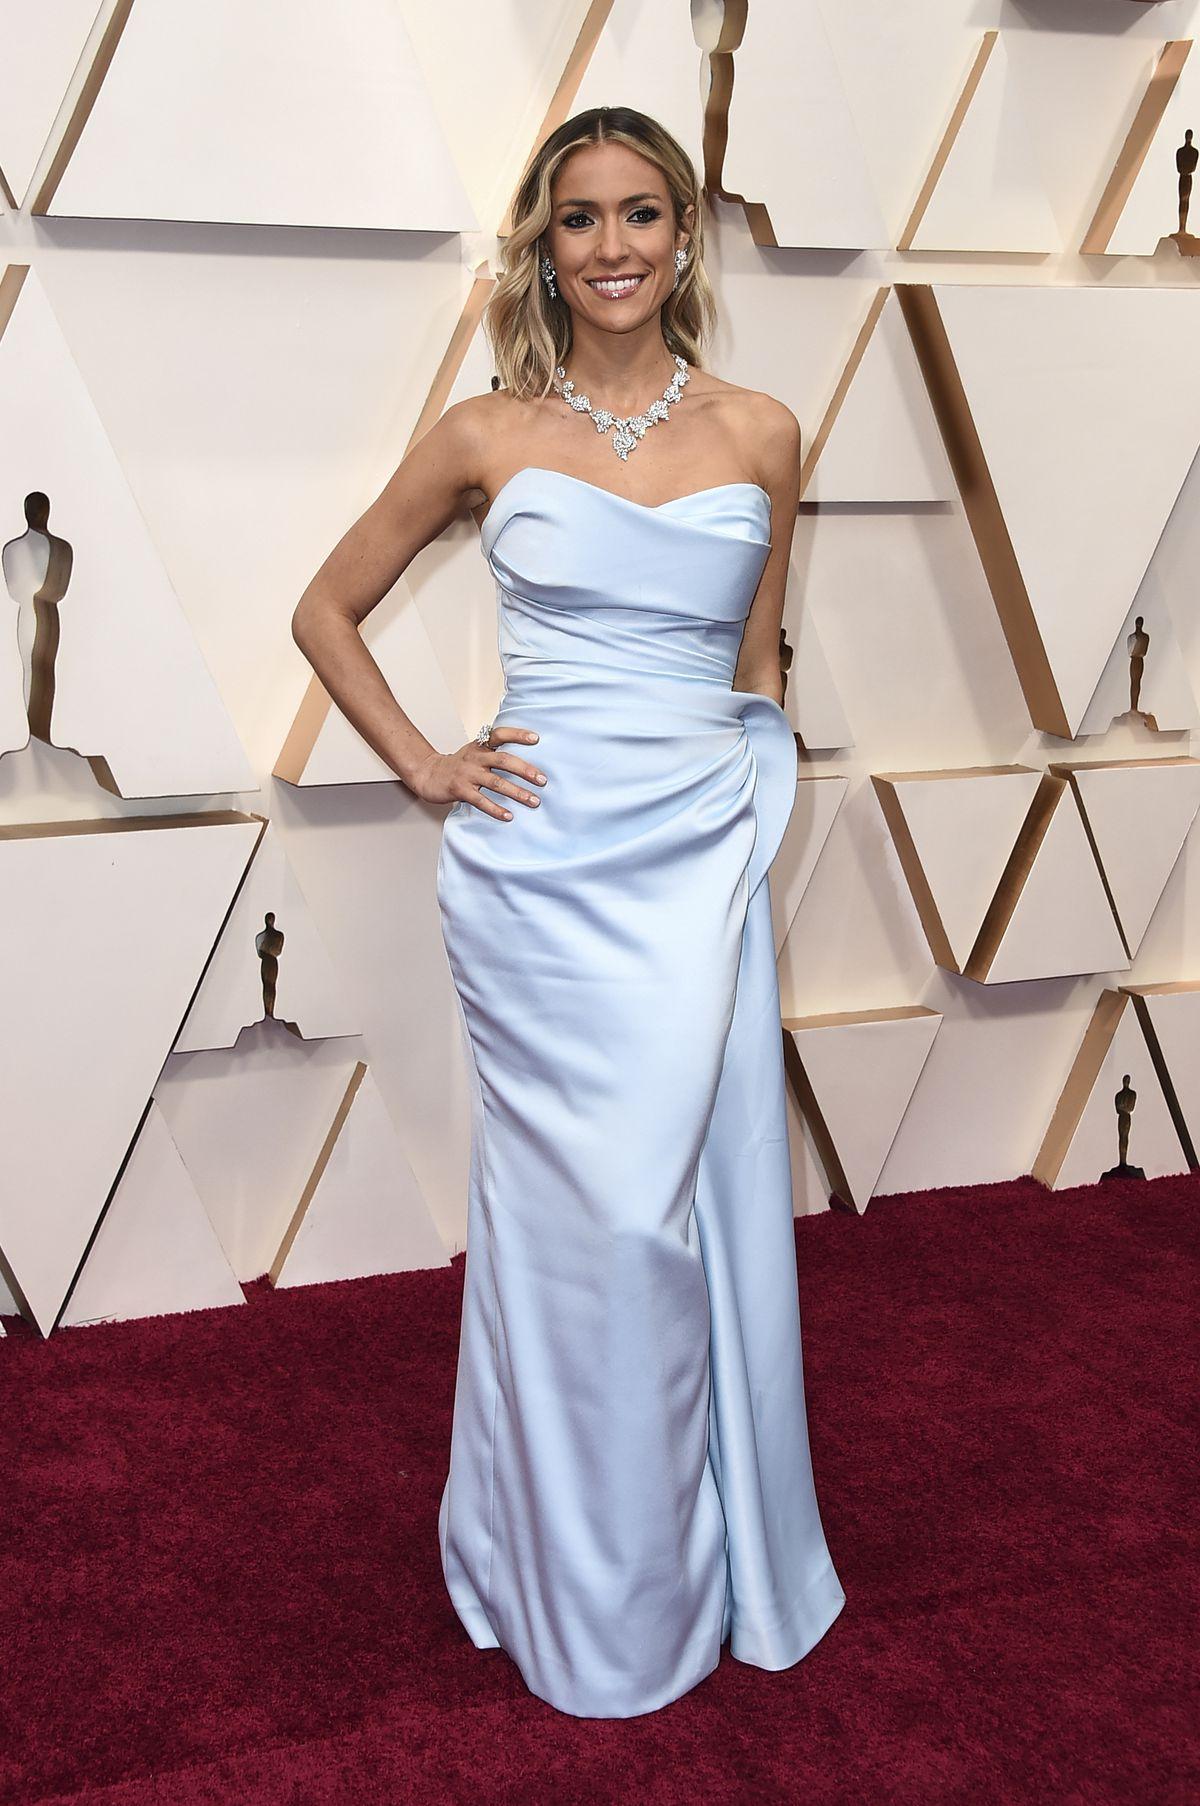 Kristin Cavallari arrives at the Oscars on Sunday